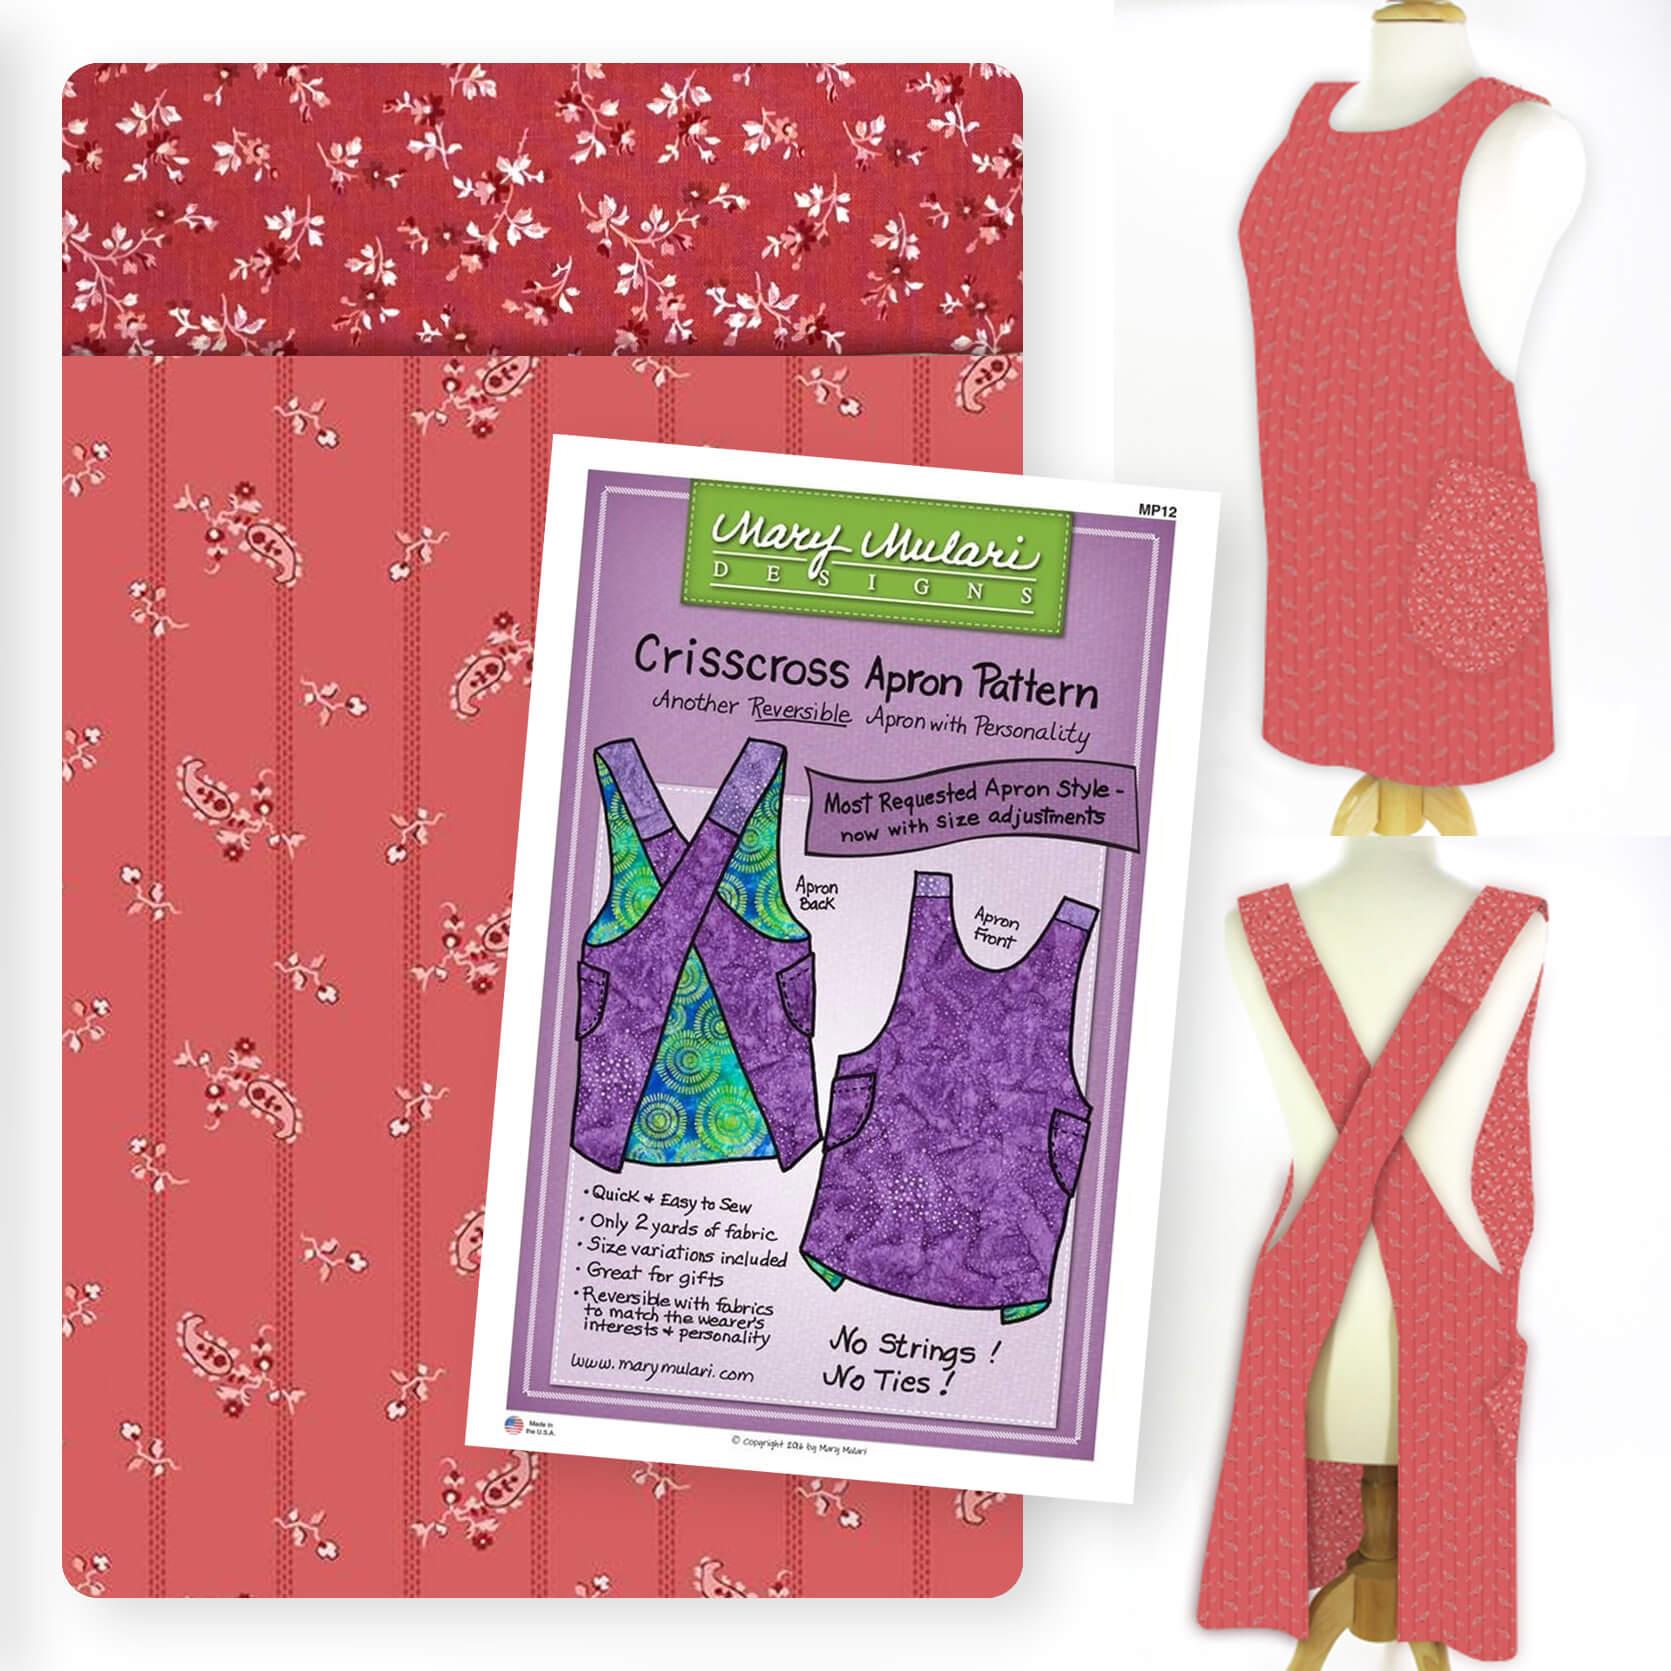 VDBCAB_01 Valentines Day Berry Crisscross Apron Bundle available at Nancy Zieman Productions at ShopNZP.com